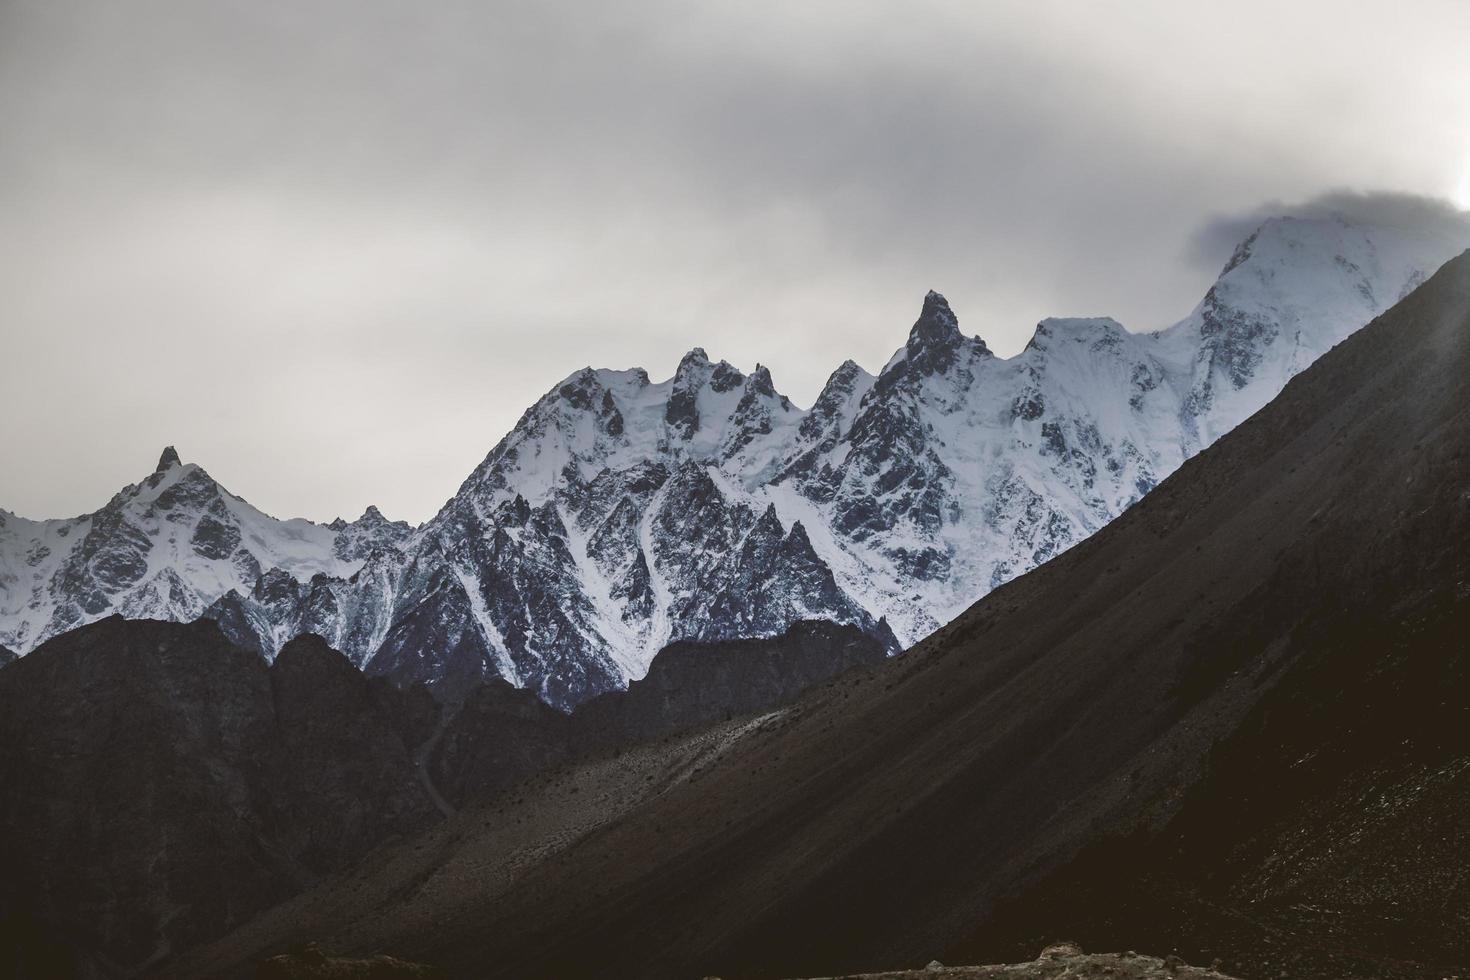 Montagnes du Karakoram enneigées photo